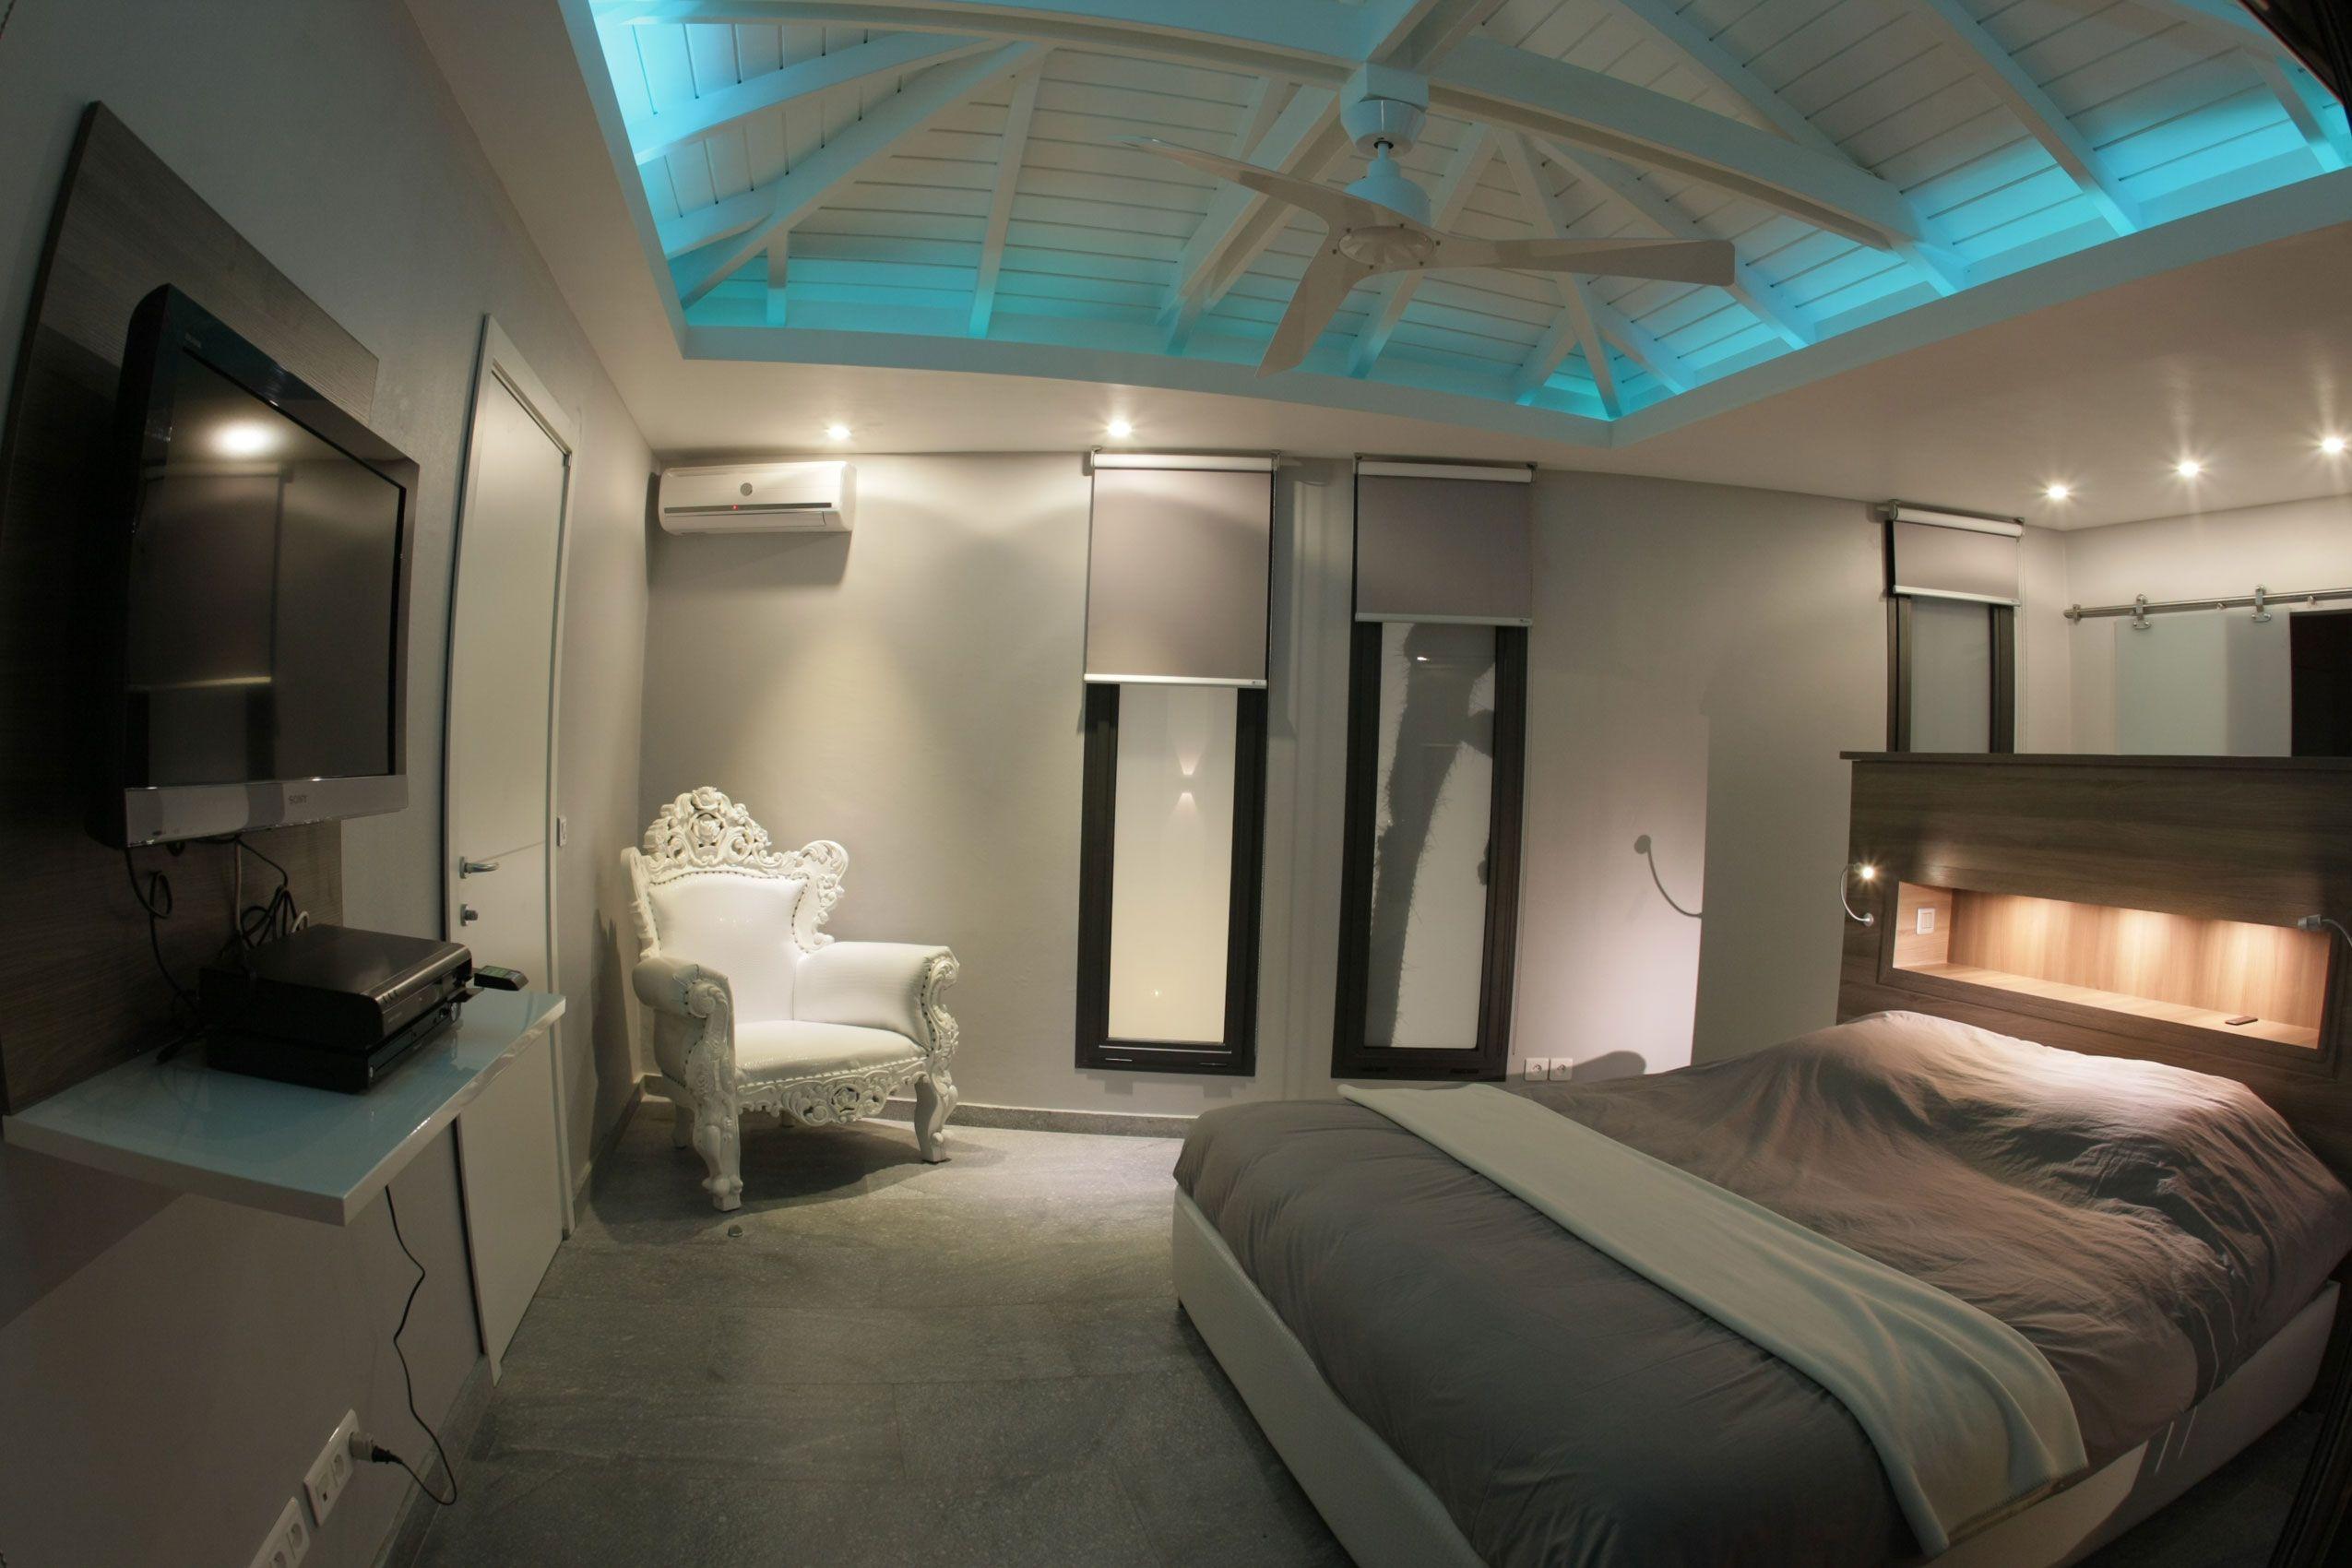 blue-false-ceiling-light - Art Home Design and Remodel ...